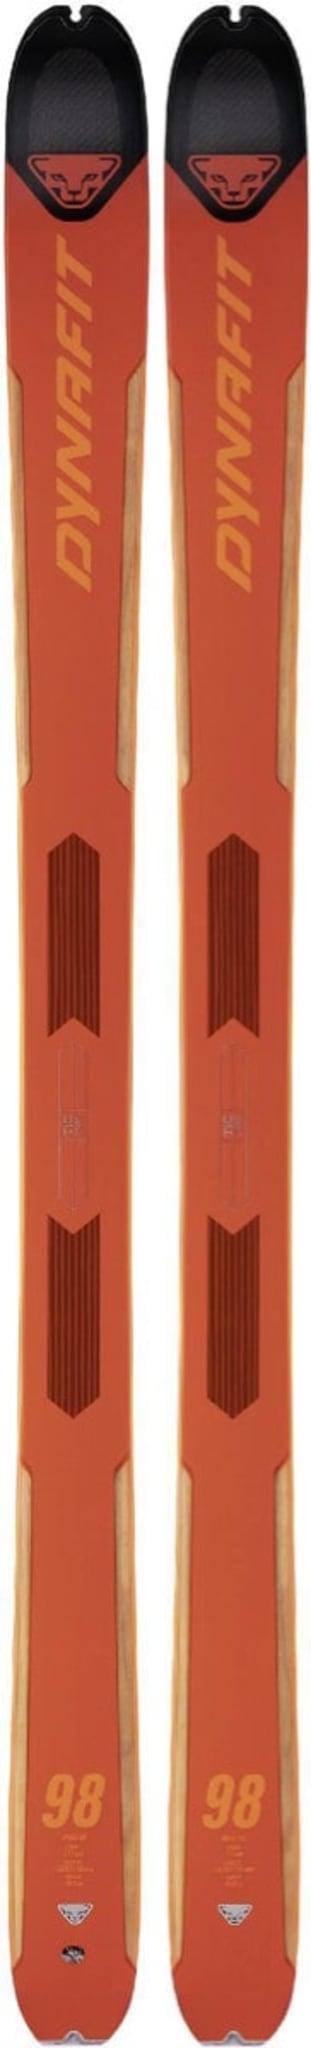 Beast 98 & Marker Alpinist 12